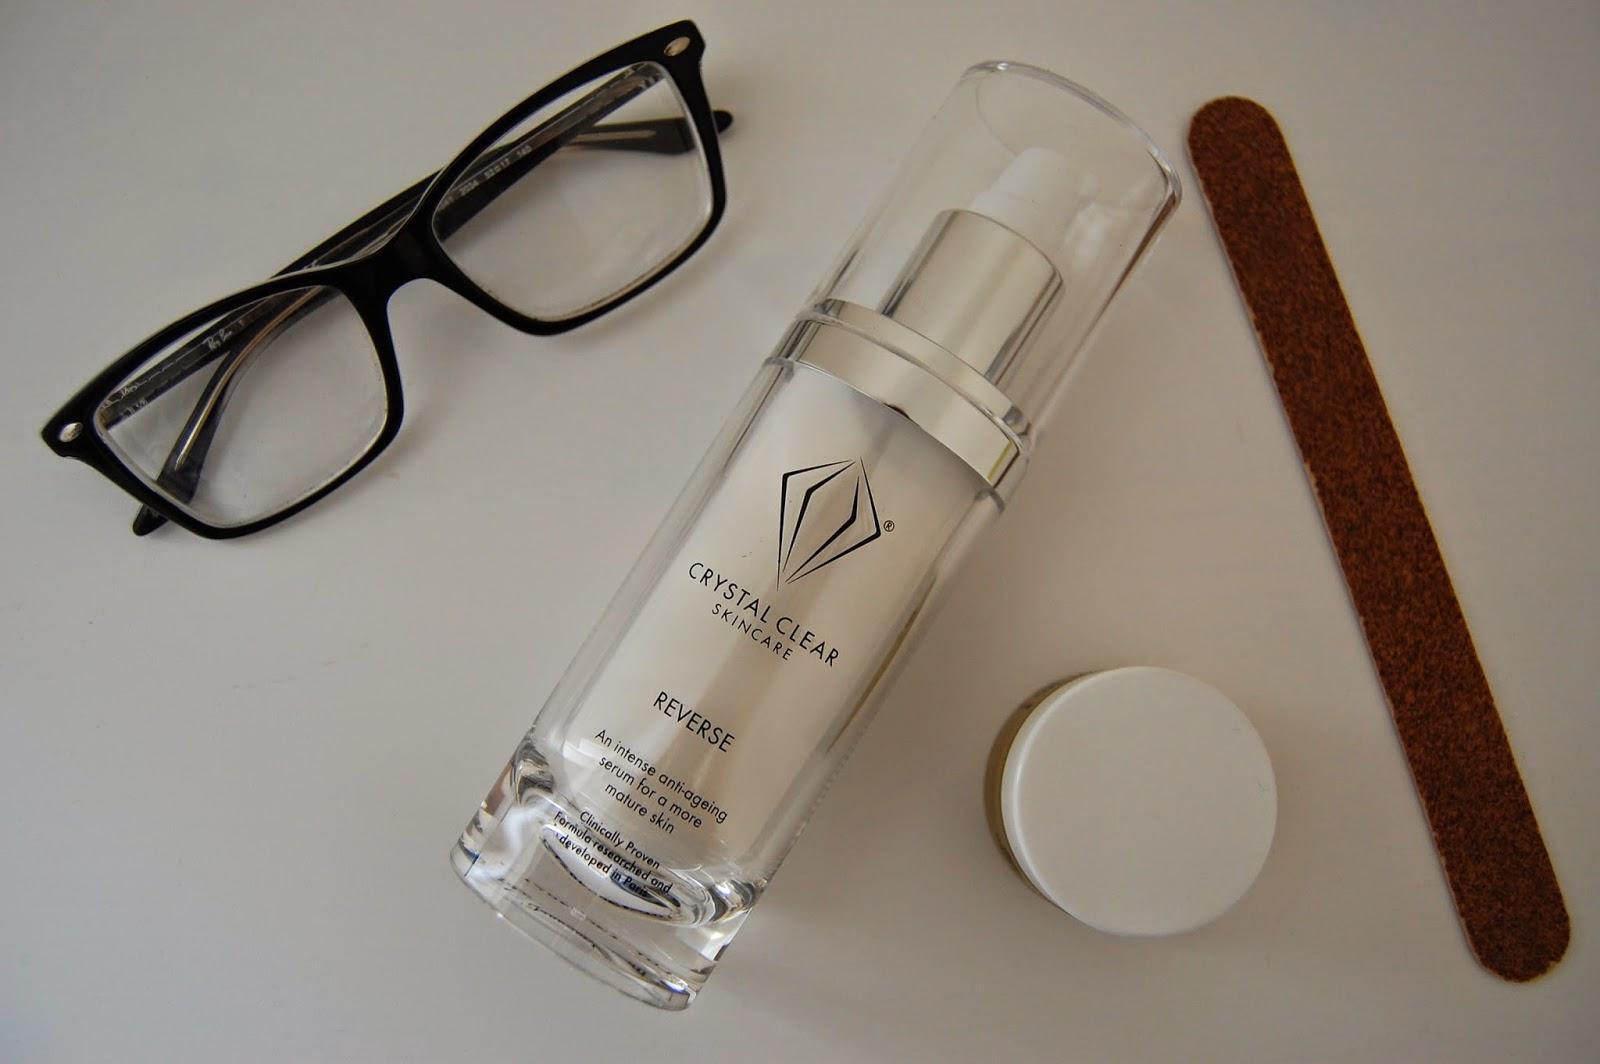 Crystal Clear Skincare Reverse Moisturiser